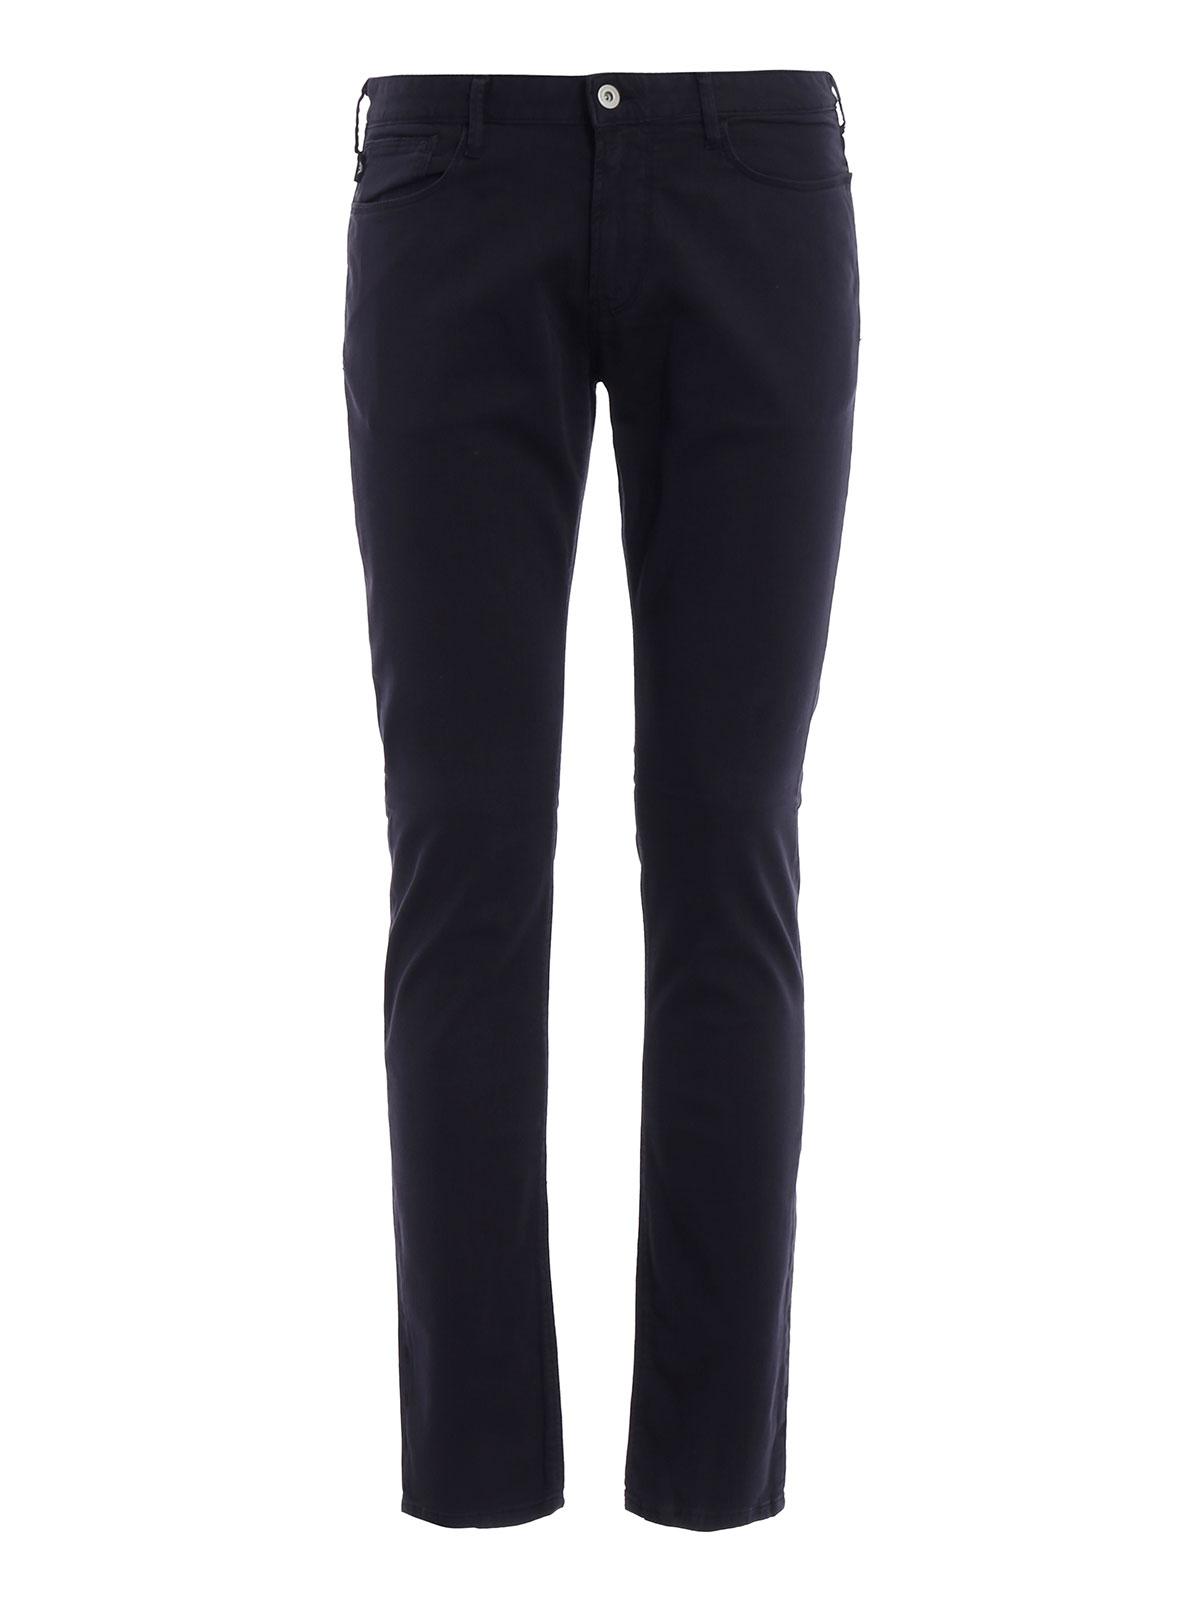 Picture of EMPORIO ARMANI | Men's Slim Fit Jeans